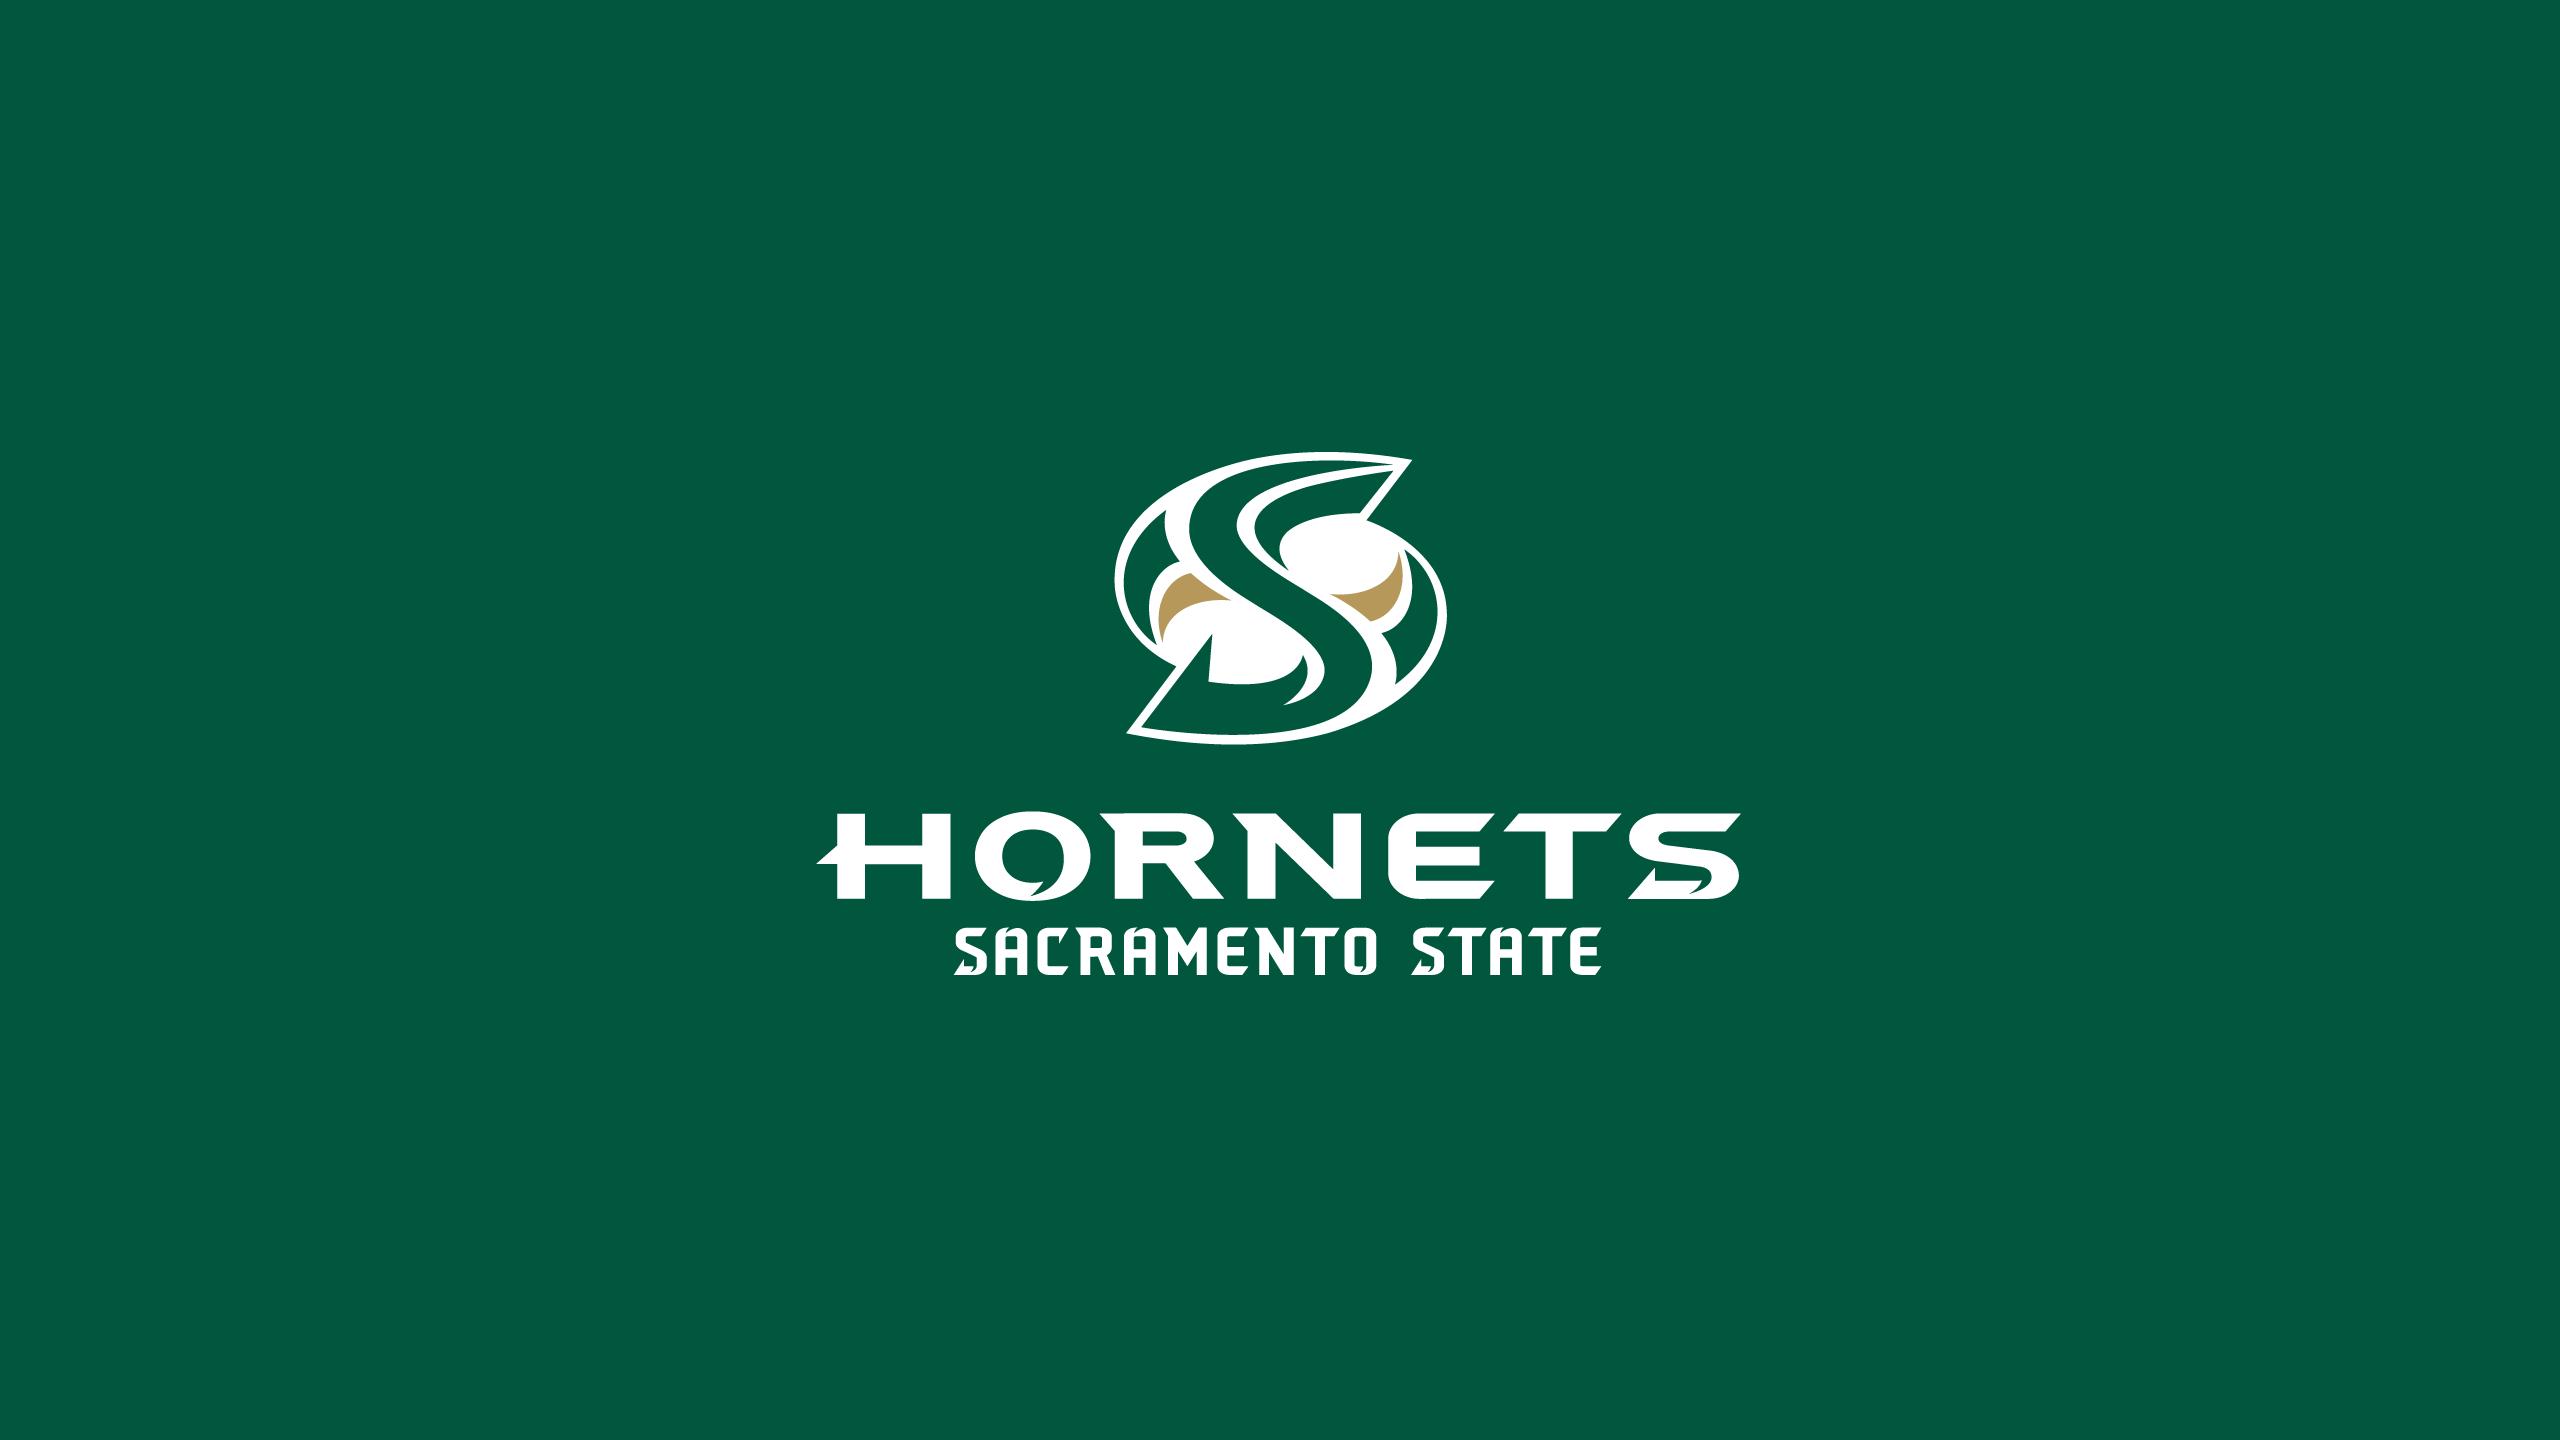 Cal State University - Sacramento Hornets